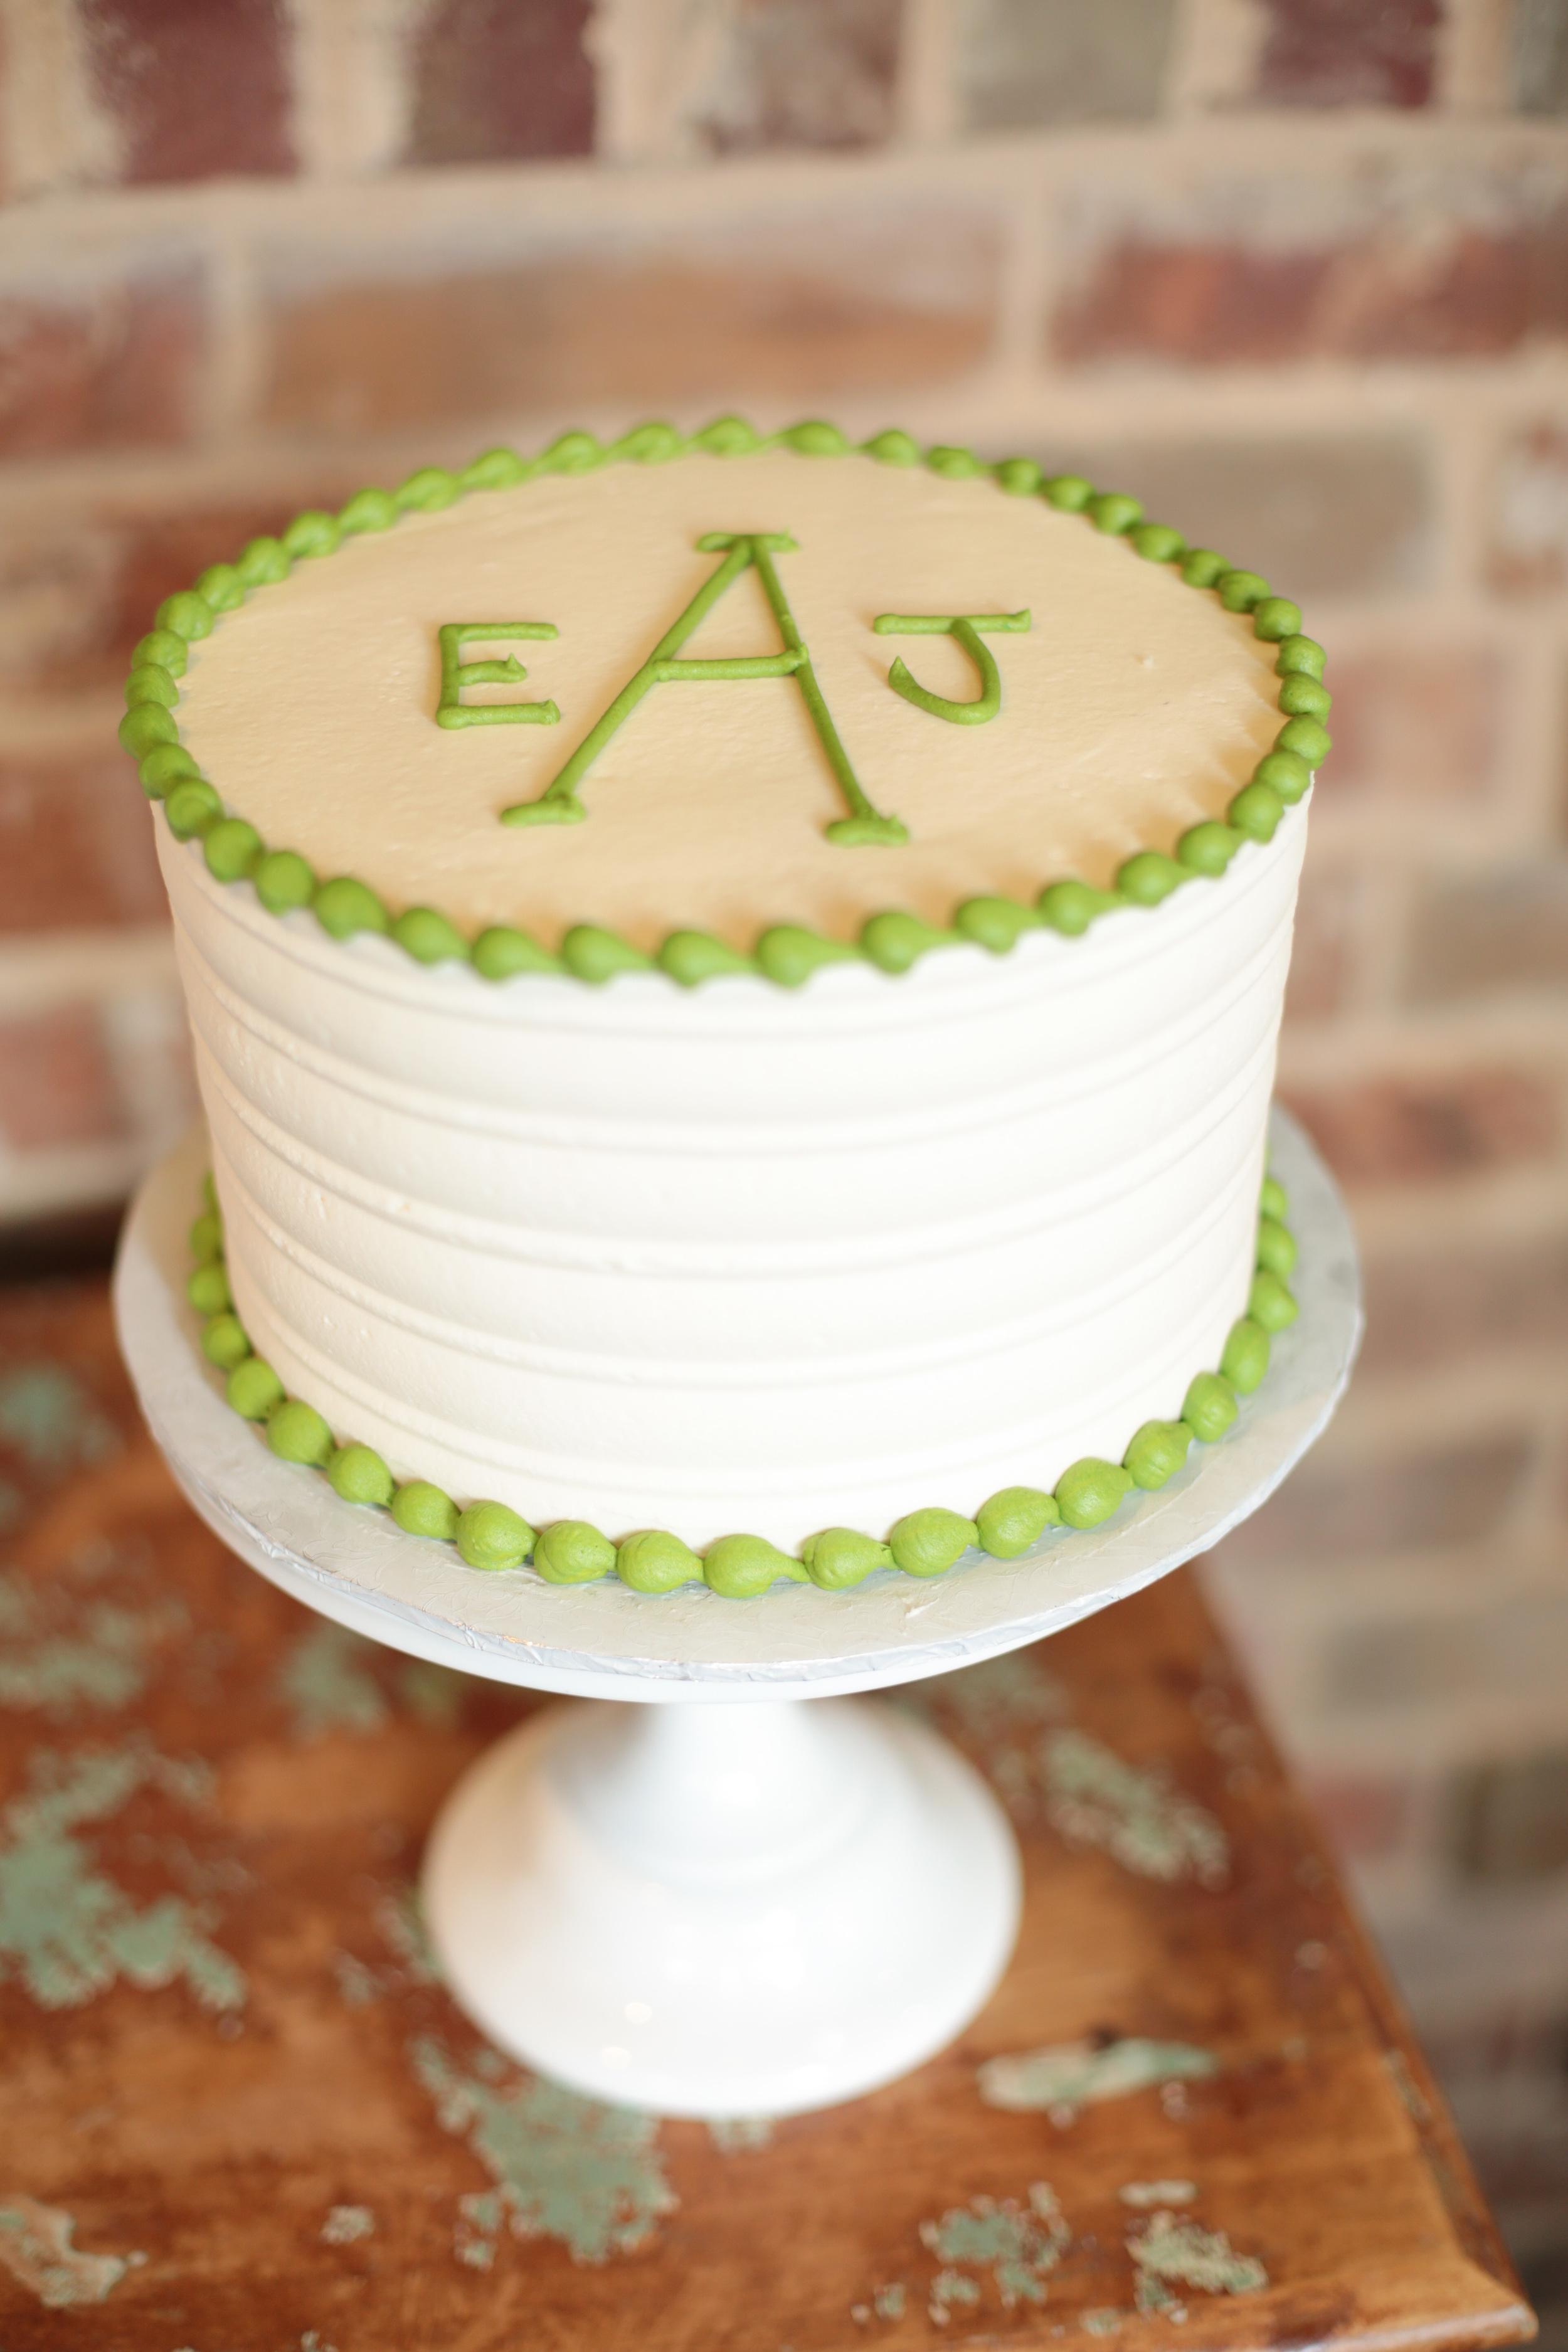 sugarbeesweets-signature-cake-combed-texture-buttercream-monogram.jpg